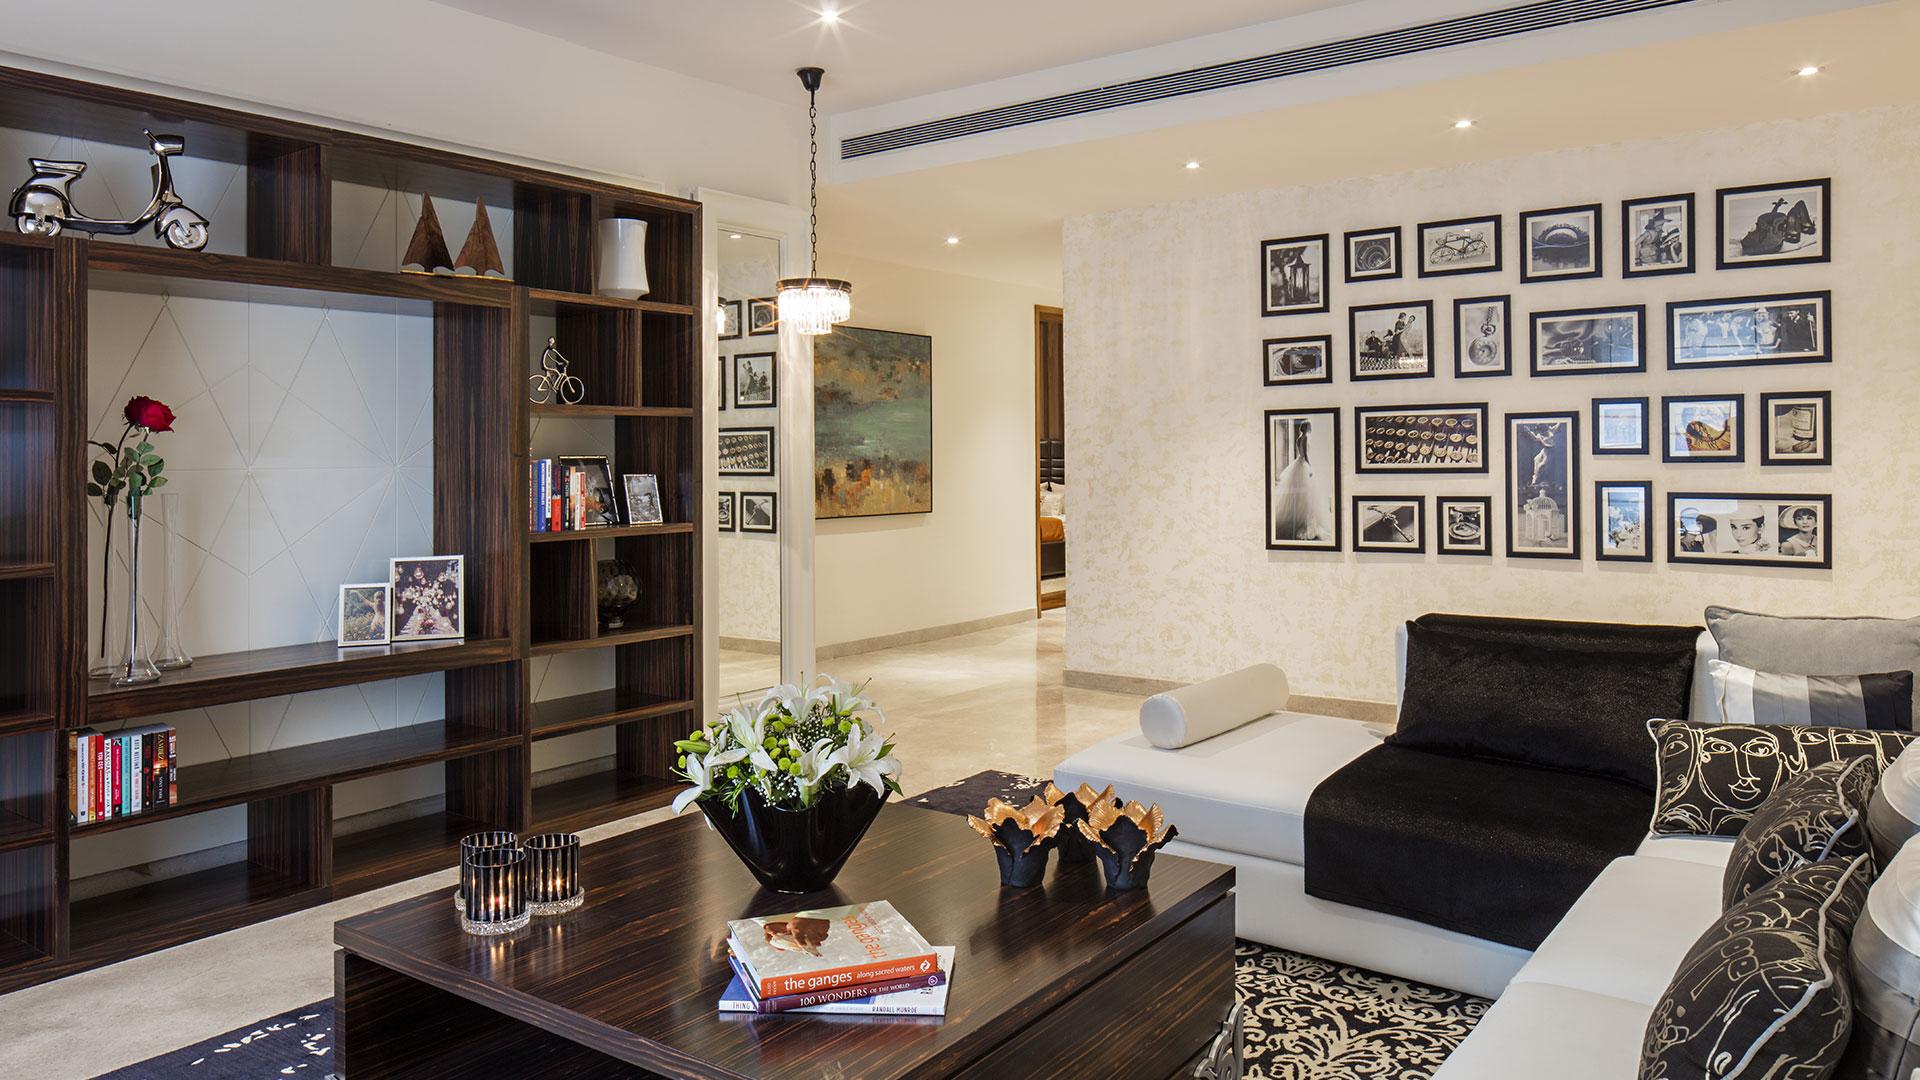 prestige-edwardian-Apartment-In-Vasanth-Nagar-Bangalore-Image-08